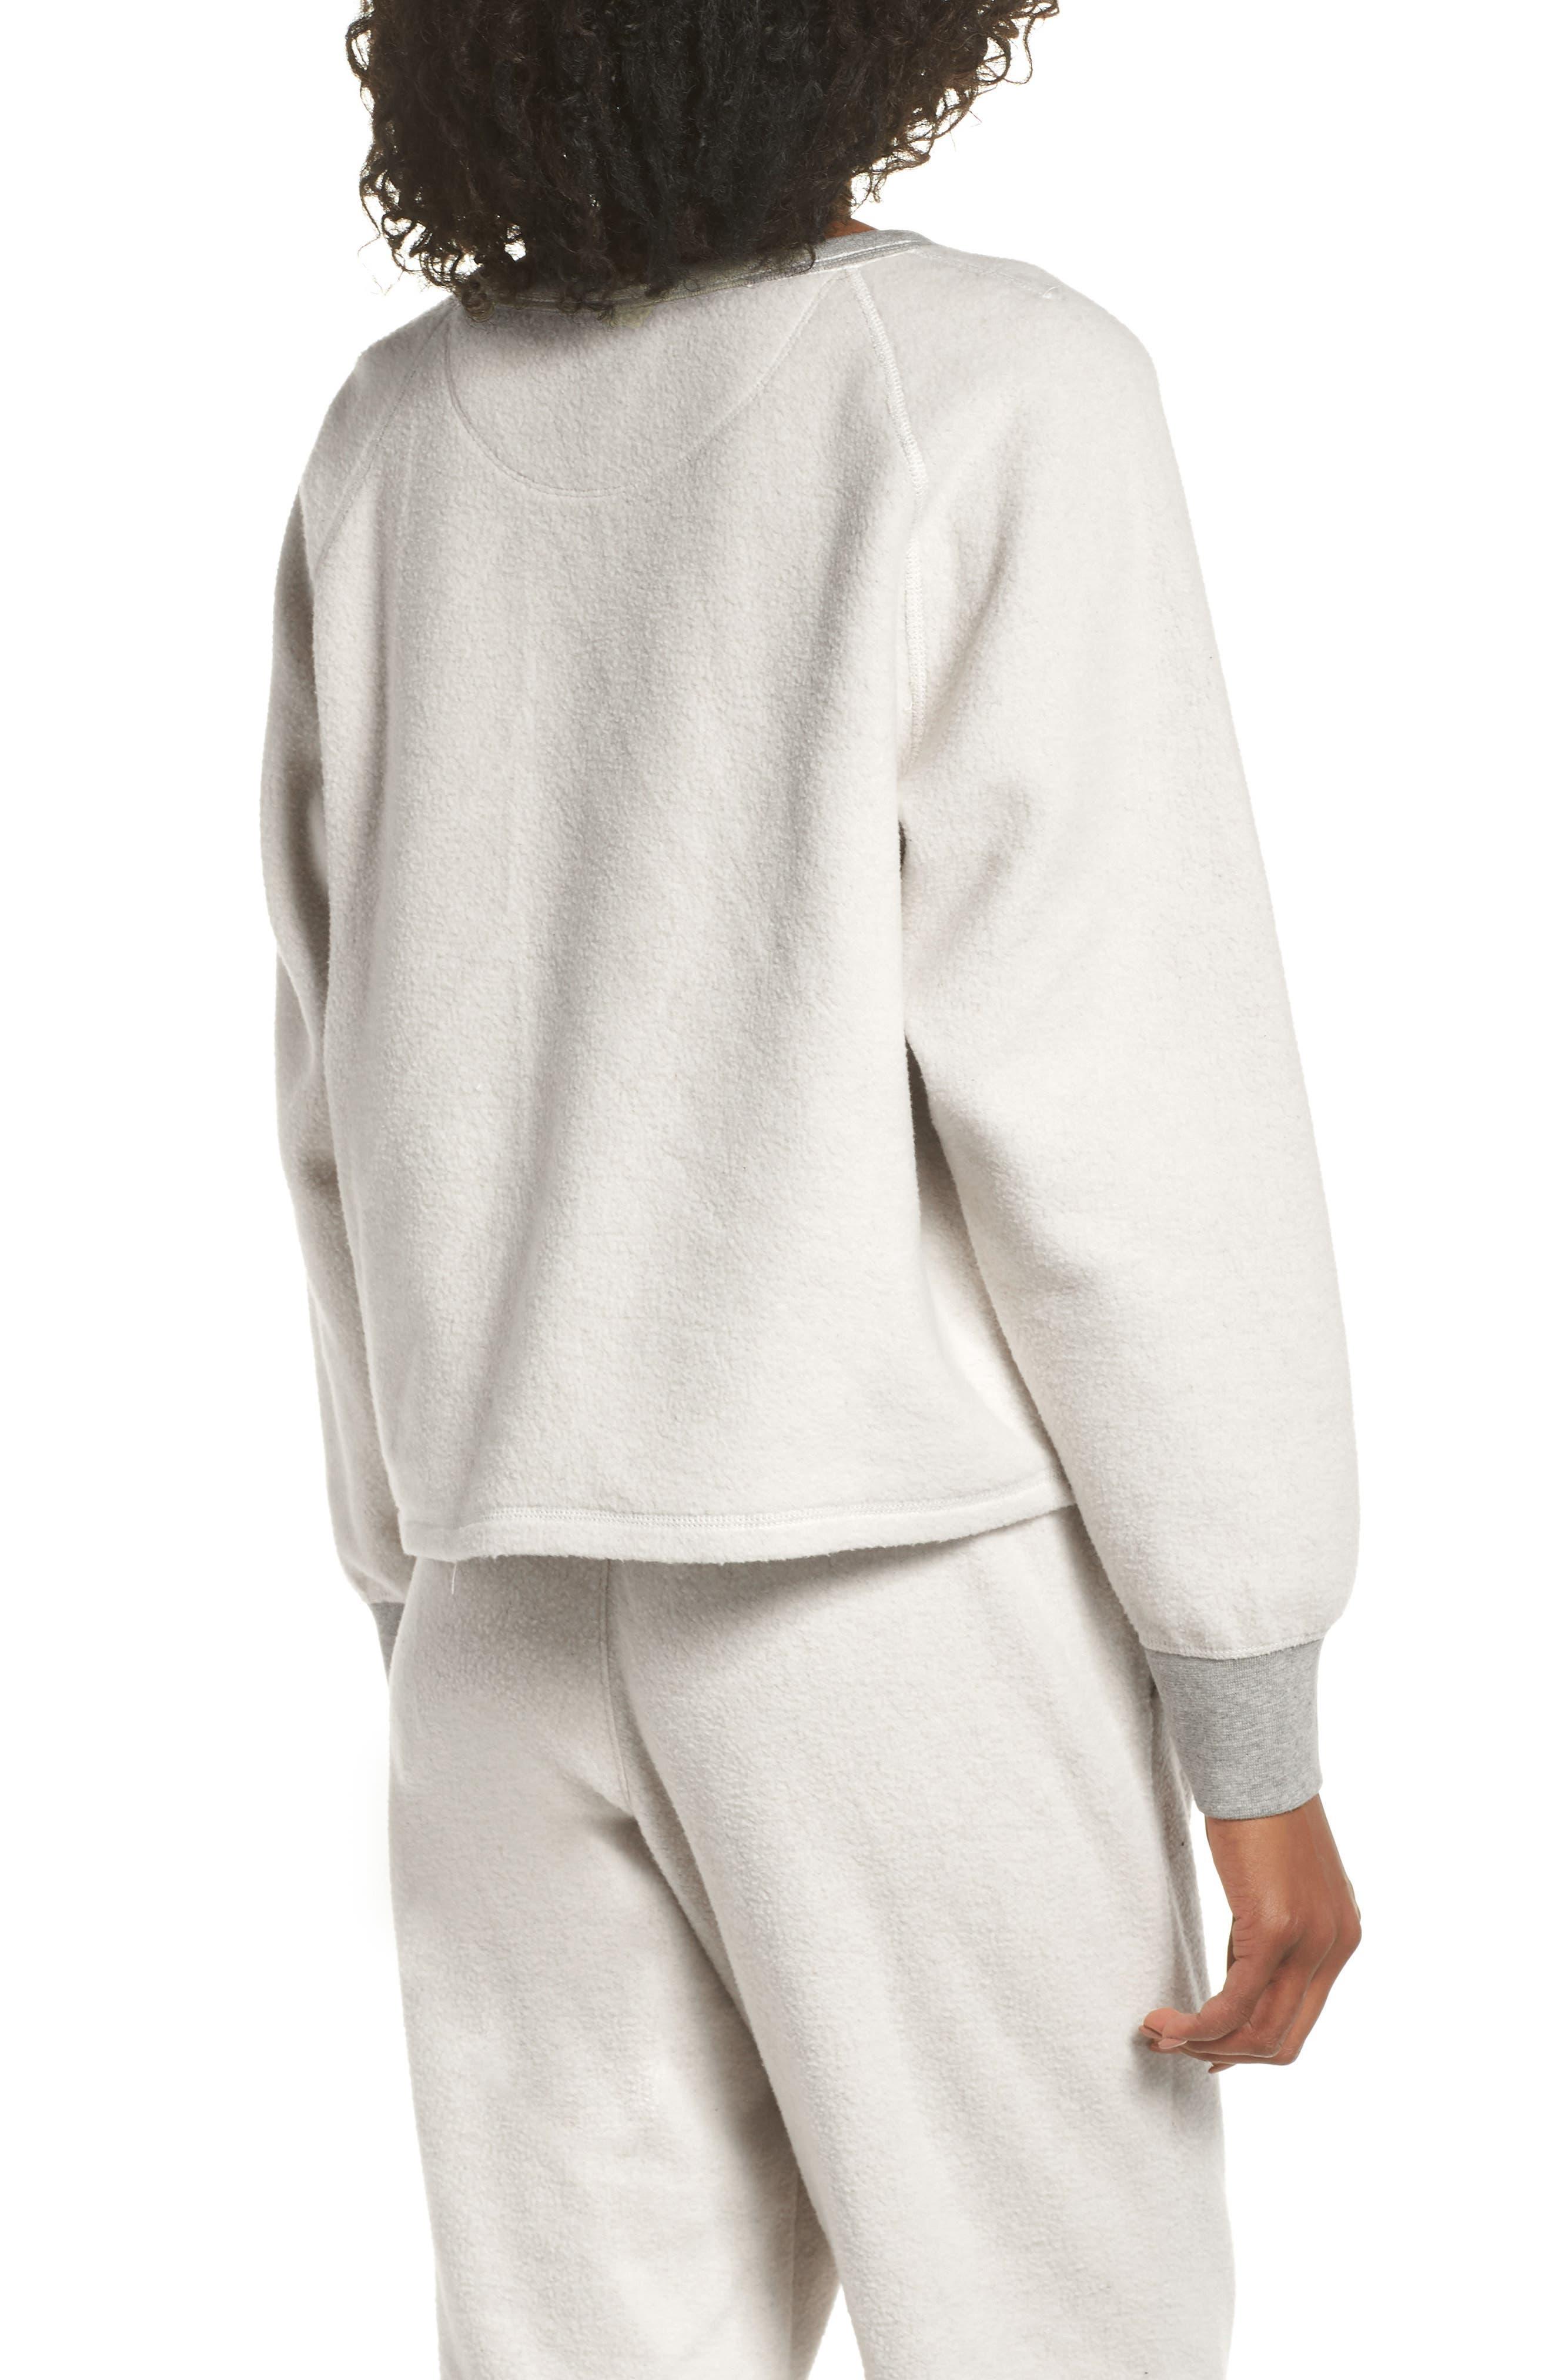 MADEWELL, Fleece Pajama Sweatshirt, Alternate thumbnail 2, color, 020